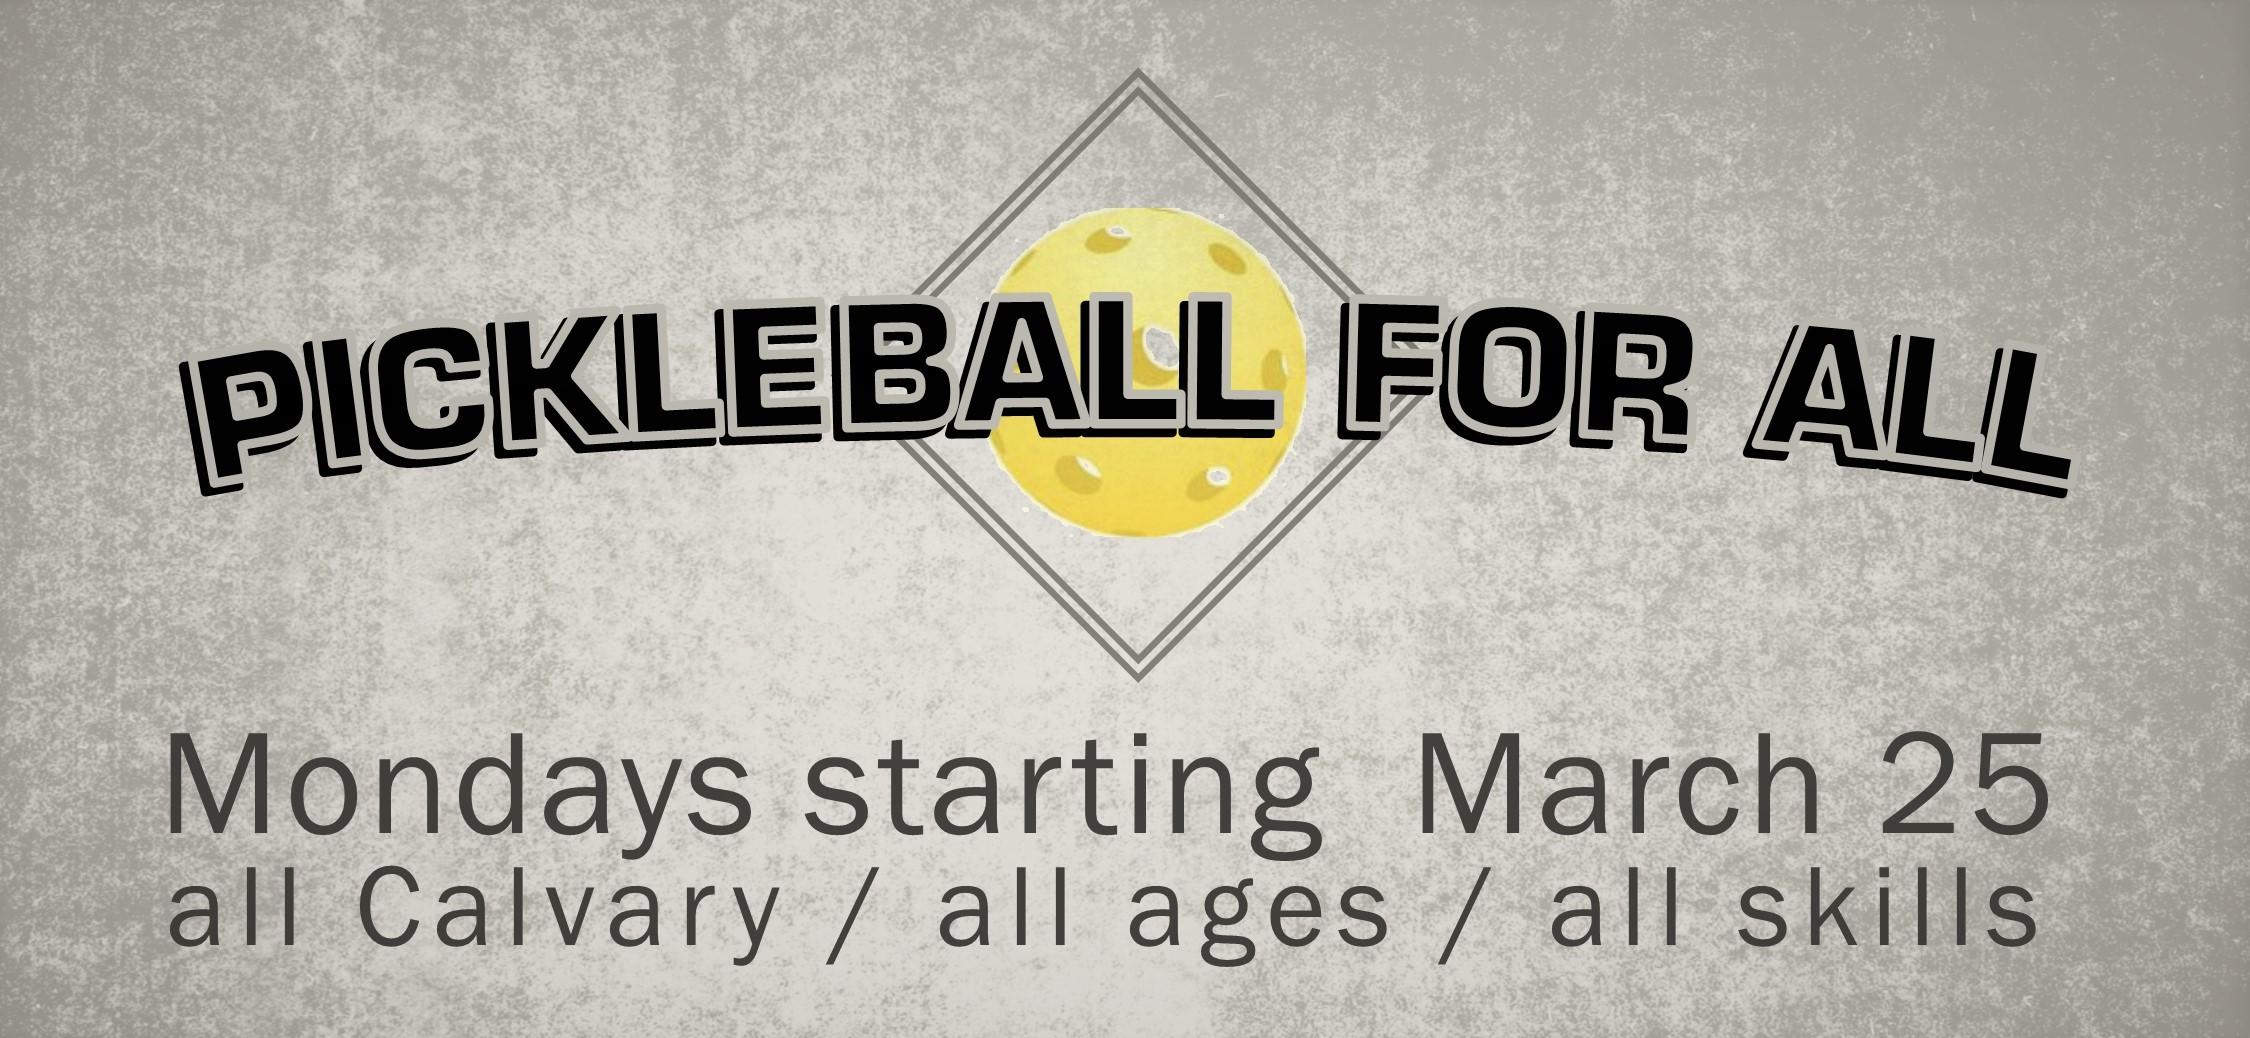 MONDAYS 6:30 - 8:00PM —more pickleball info  here.